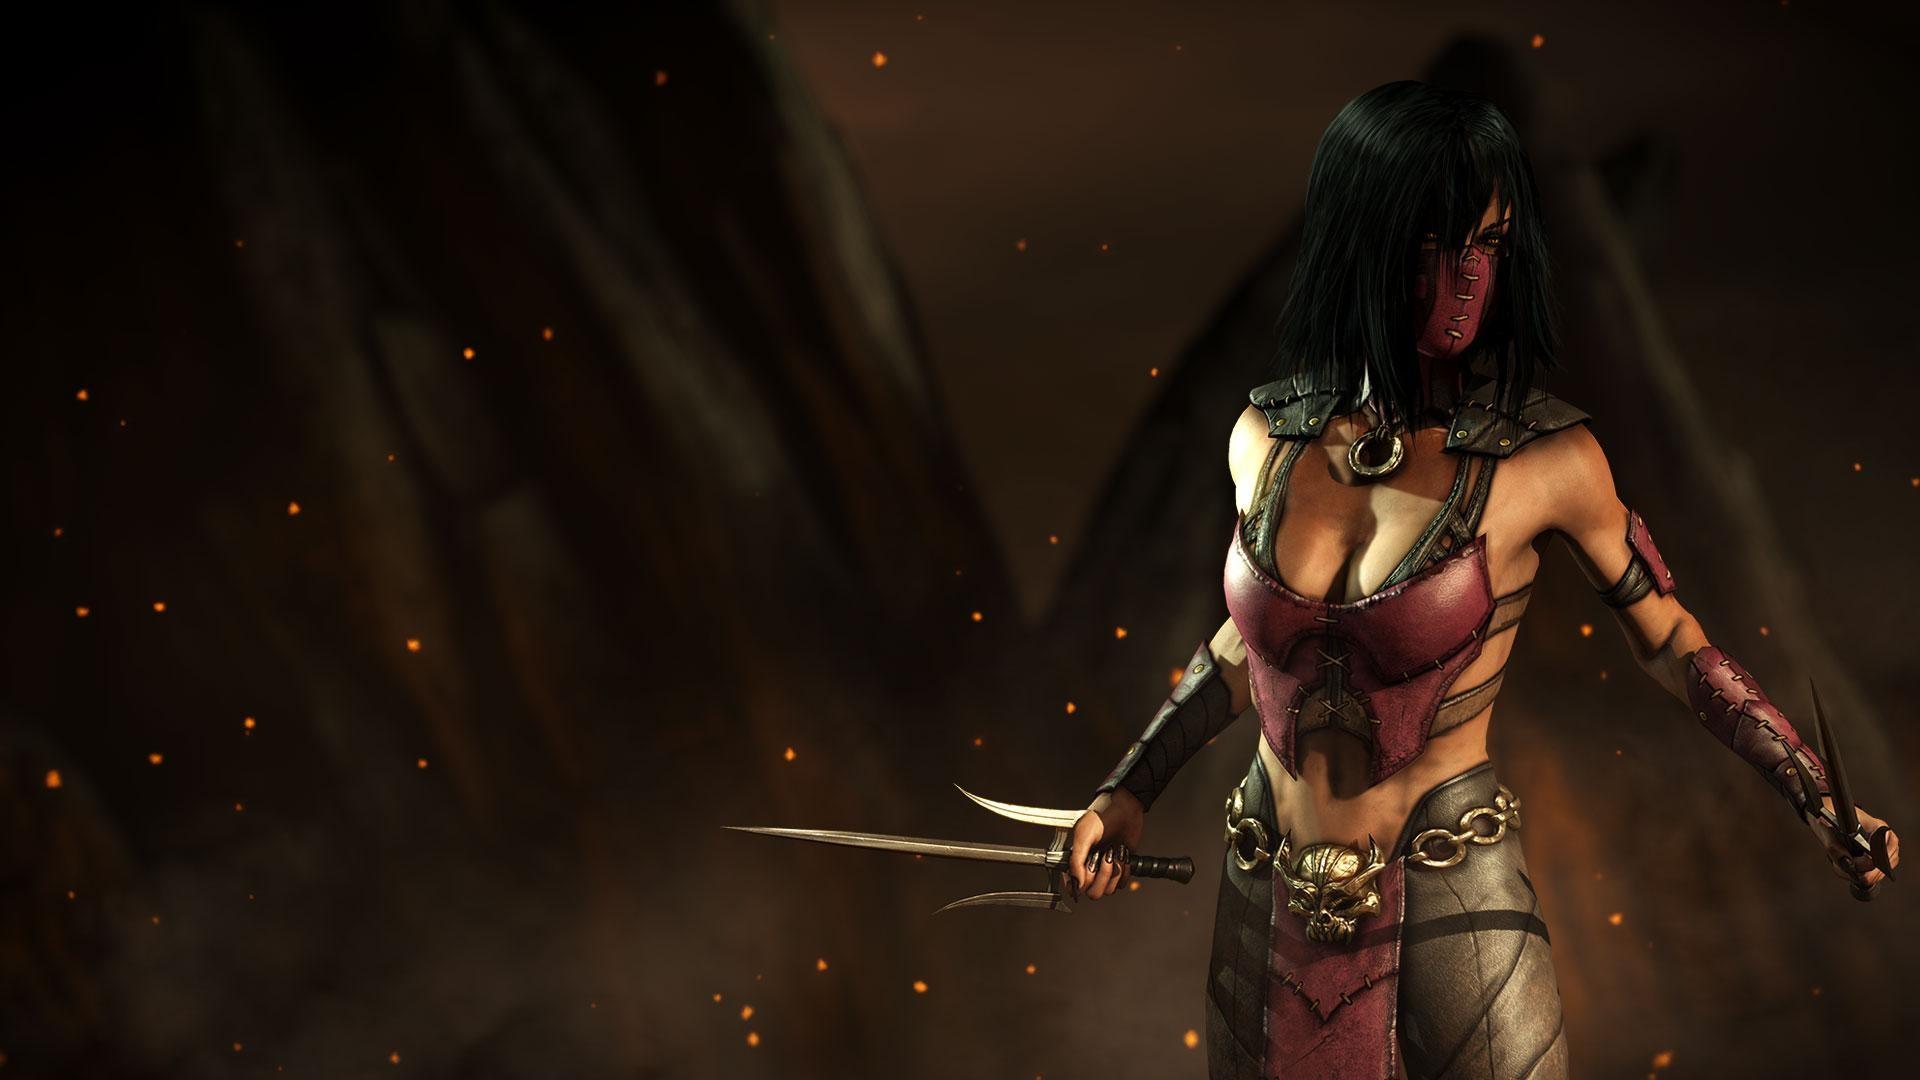 Mortal Kombat X – Character Wallpapers